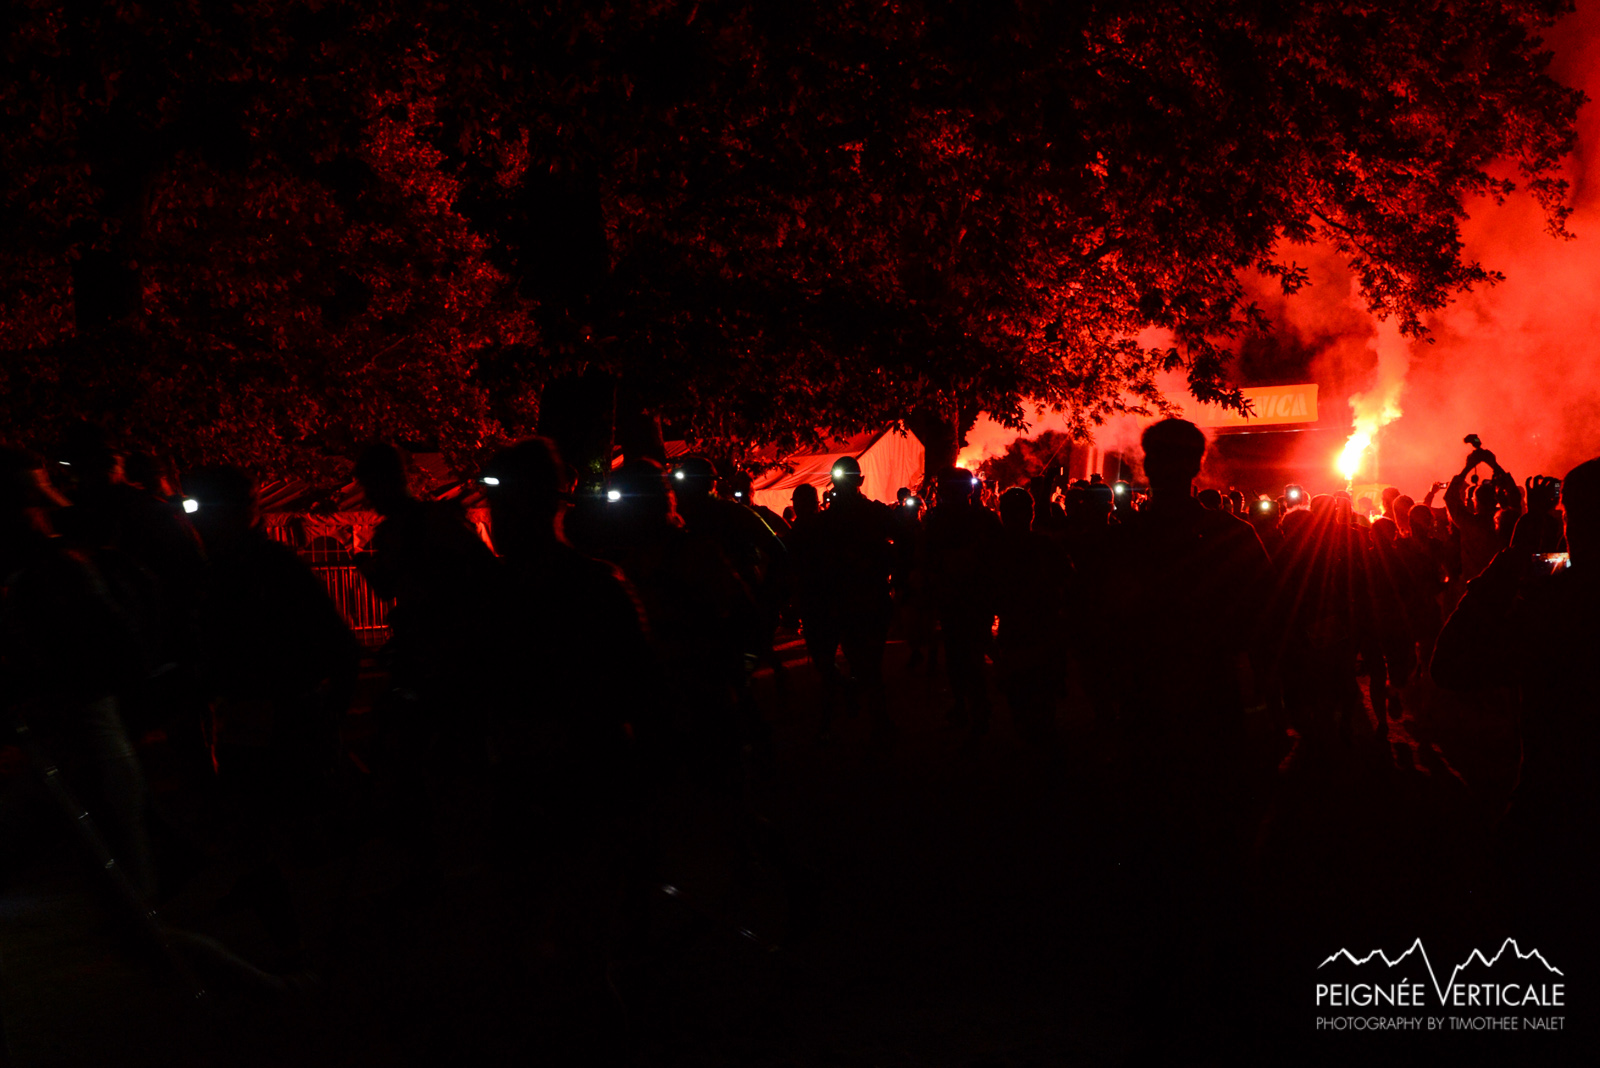 MaxiRace-Annecy-2014-Team-Hoka-Timothee-Nalet-0625.jpg